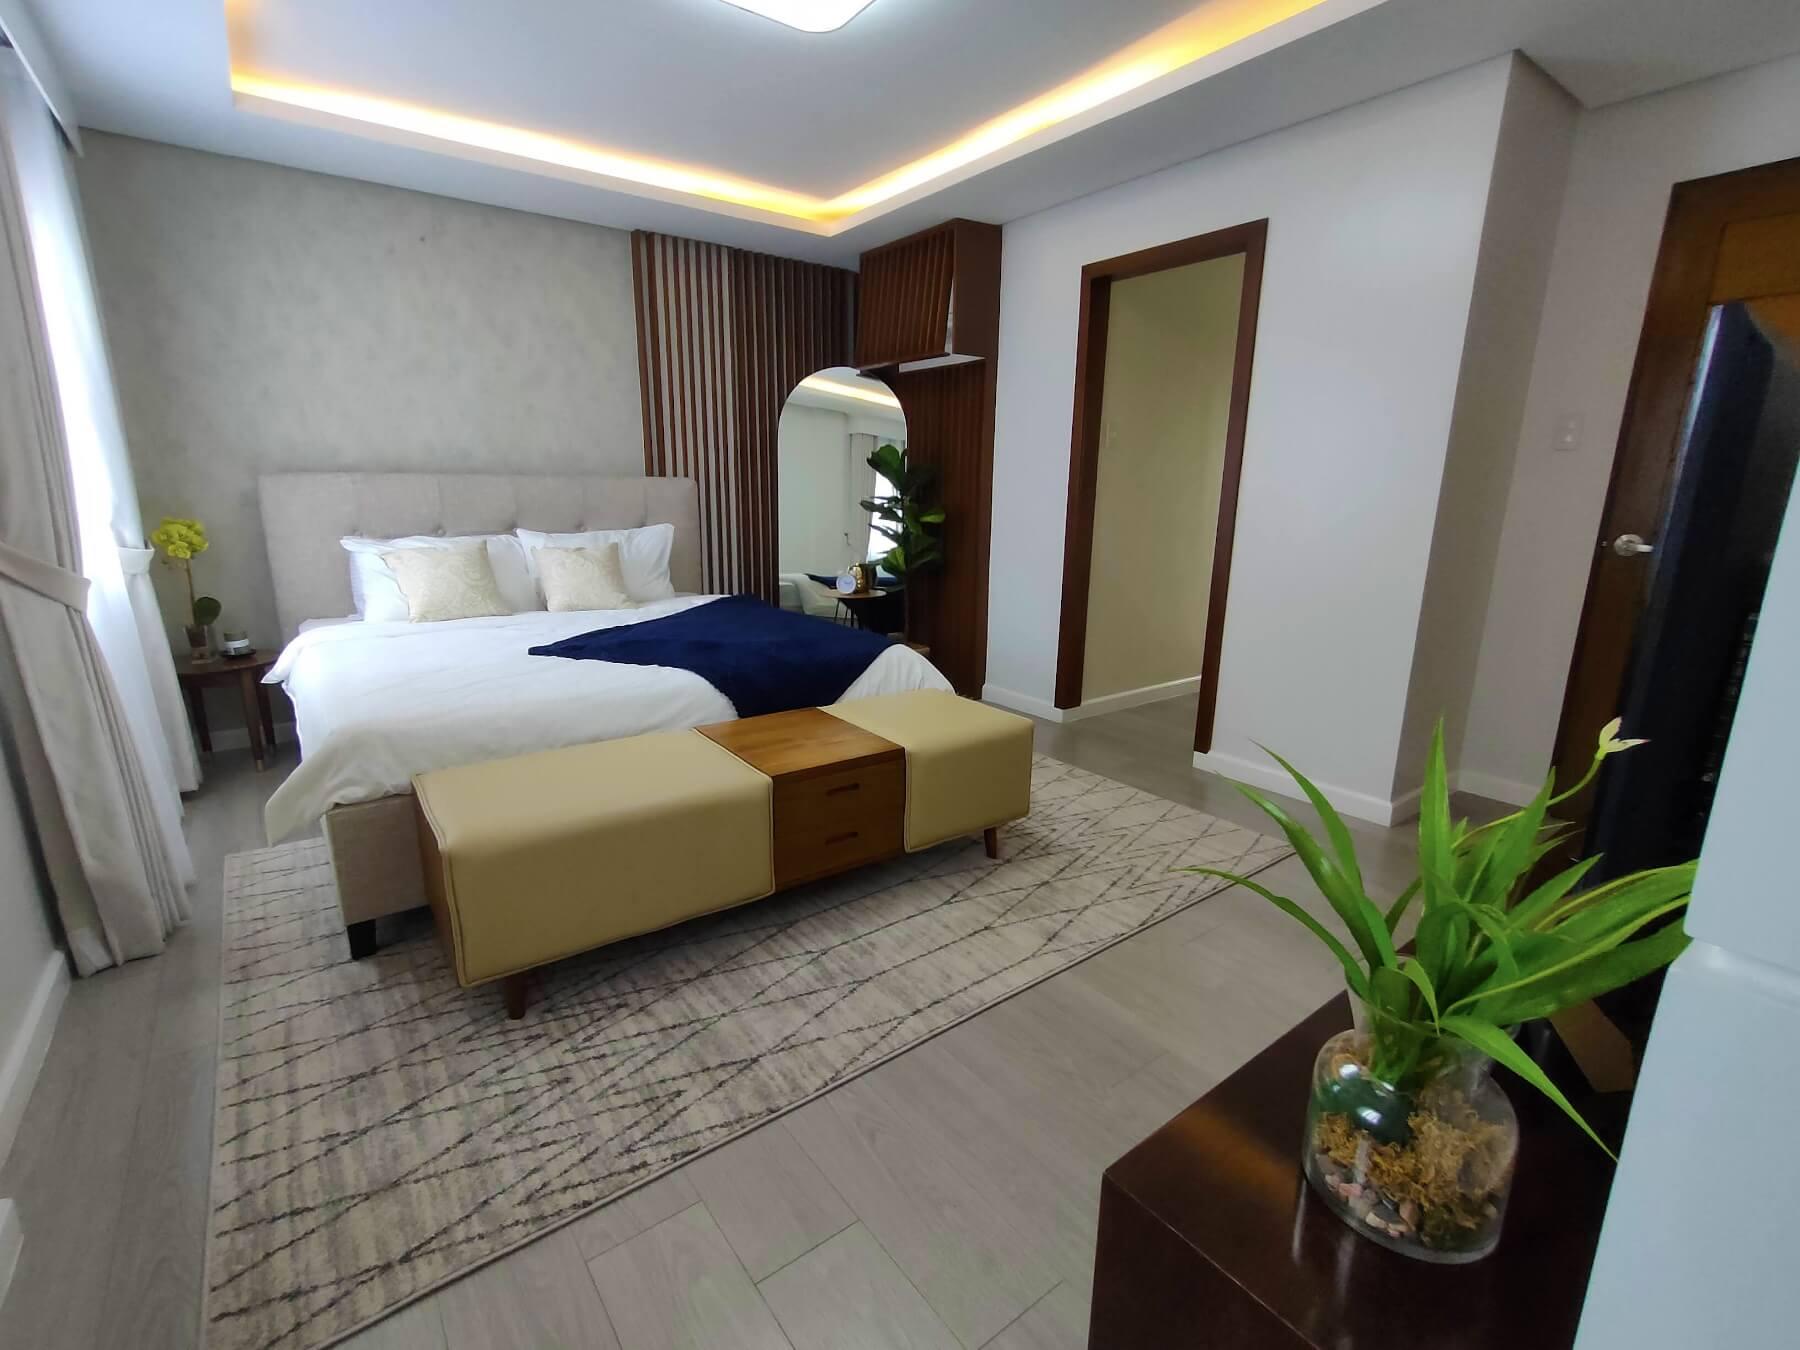 Brizlane Residences - Master's Bedroom